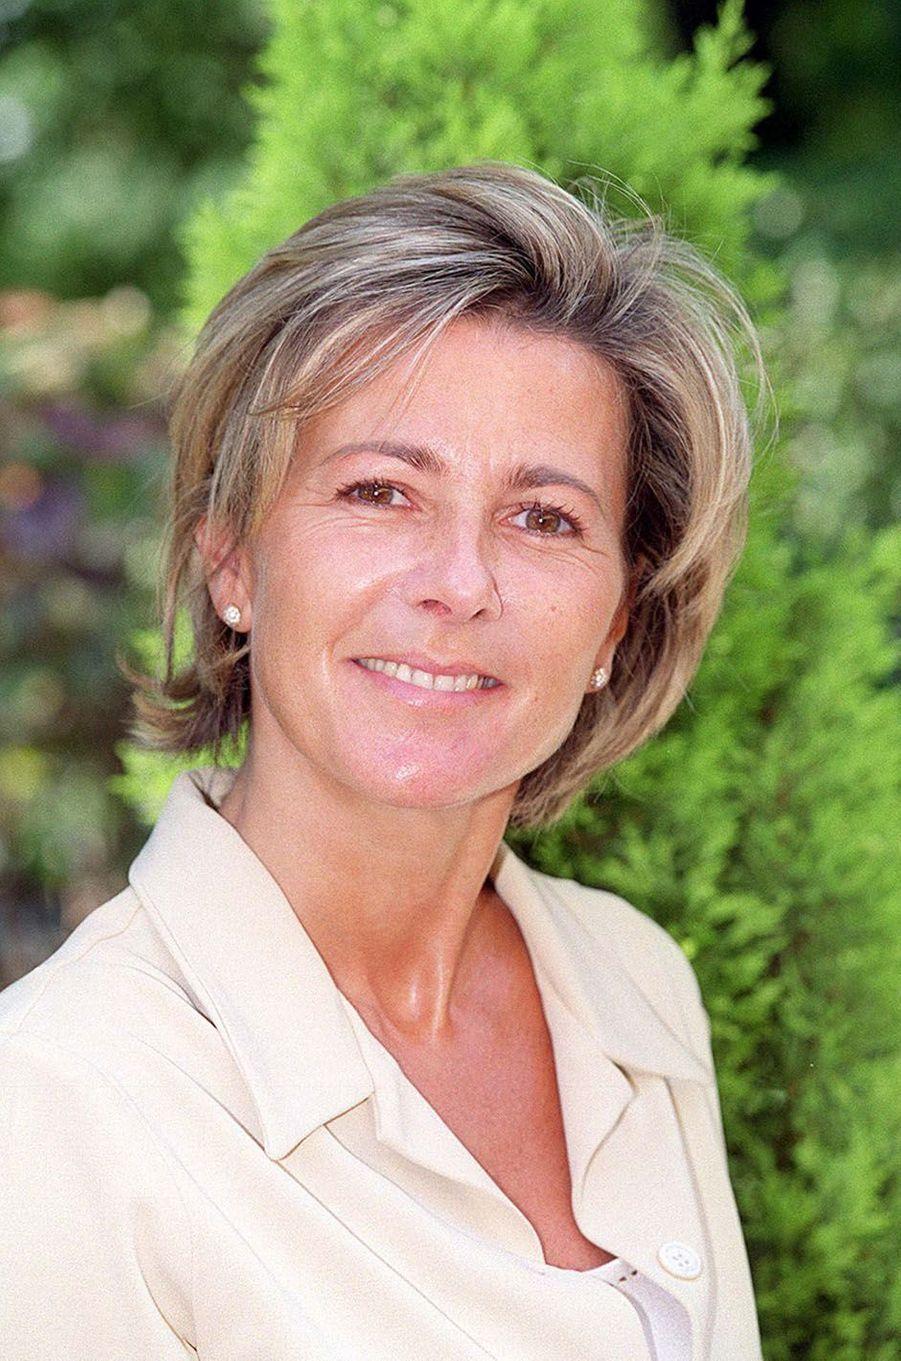 Claire Chazal en 2000